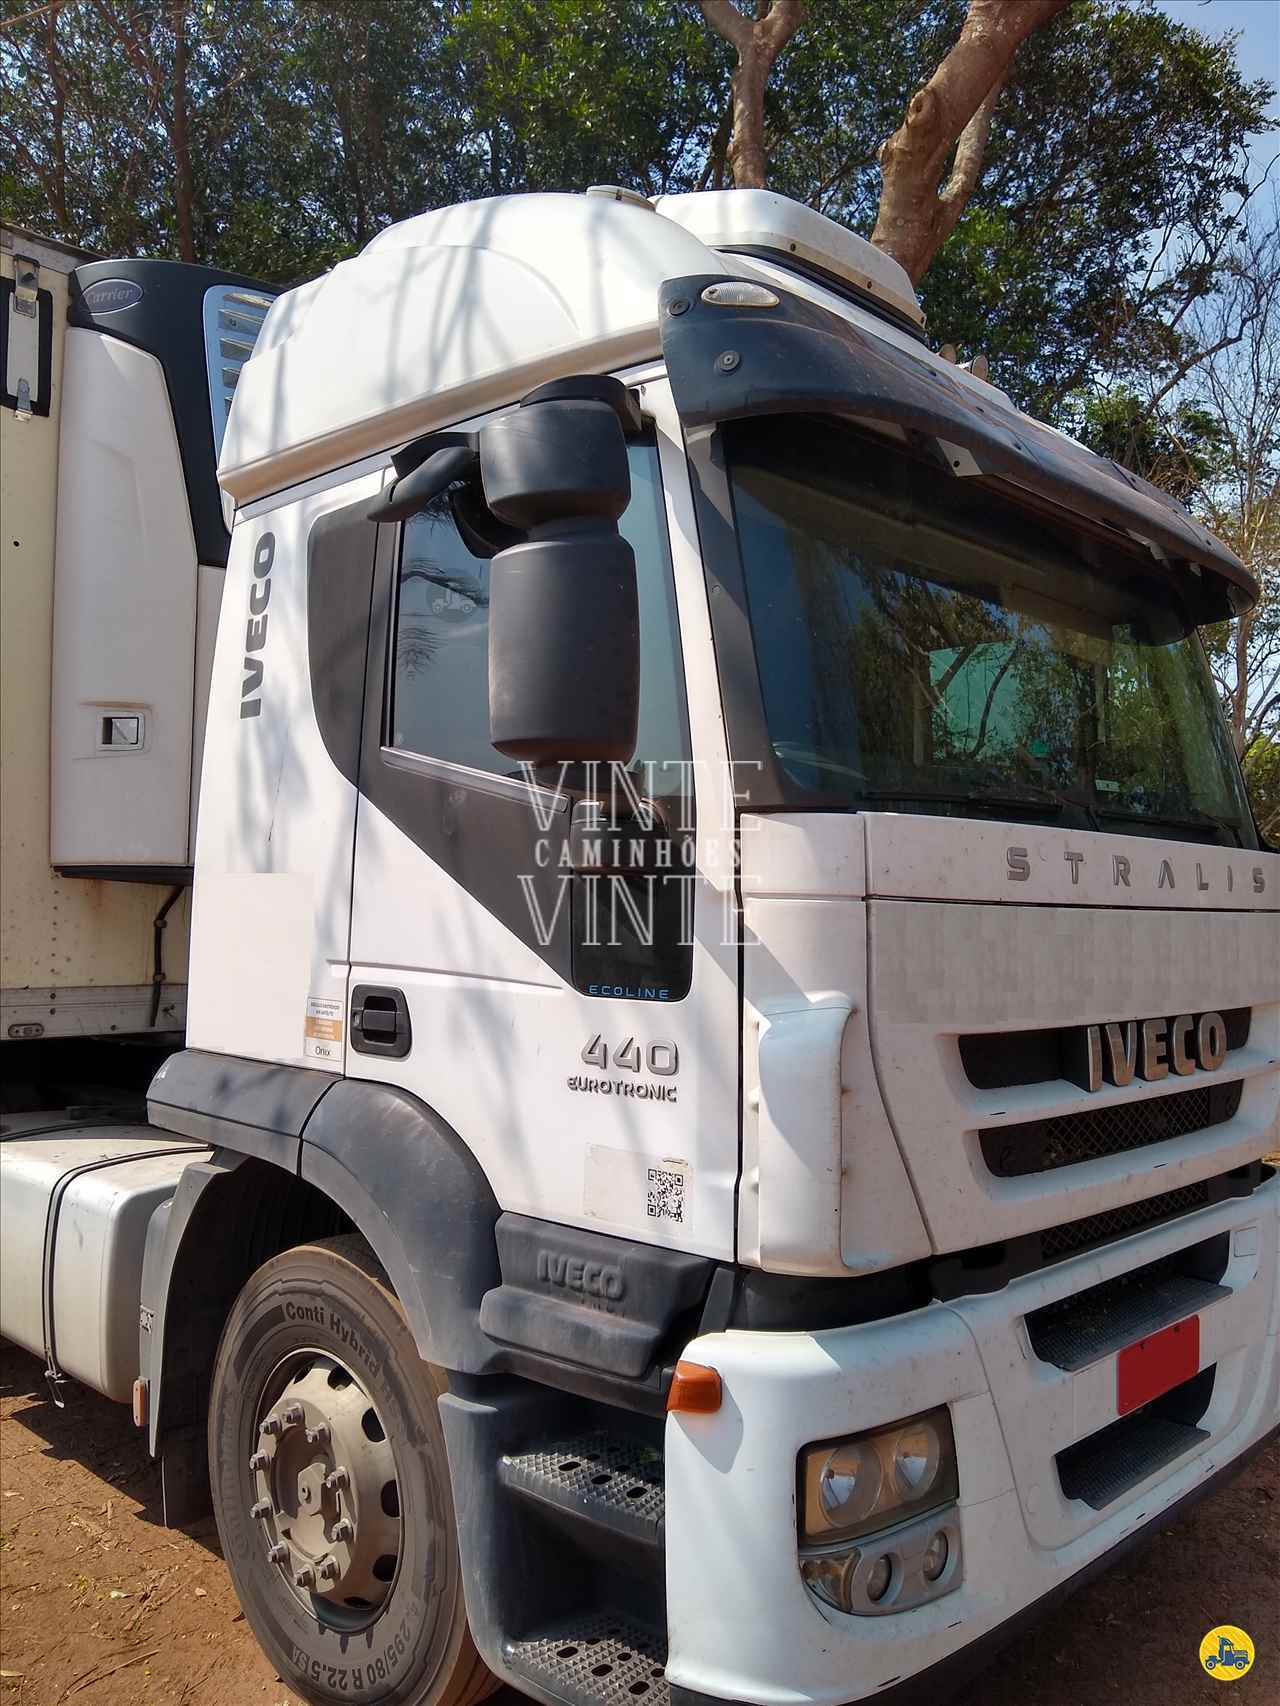 CAMINHAO IVECO STRALIS 440 Cavalo Mecânico Truck 6x2 Vinte-Vinte Caminhões SANTO ANDRE SÃO PAULO SP